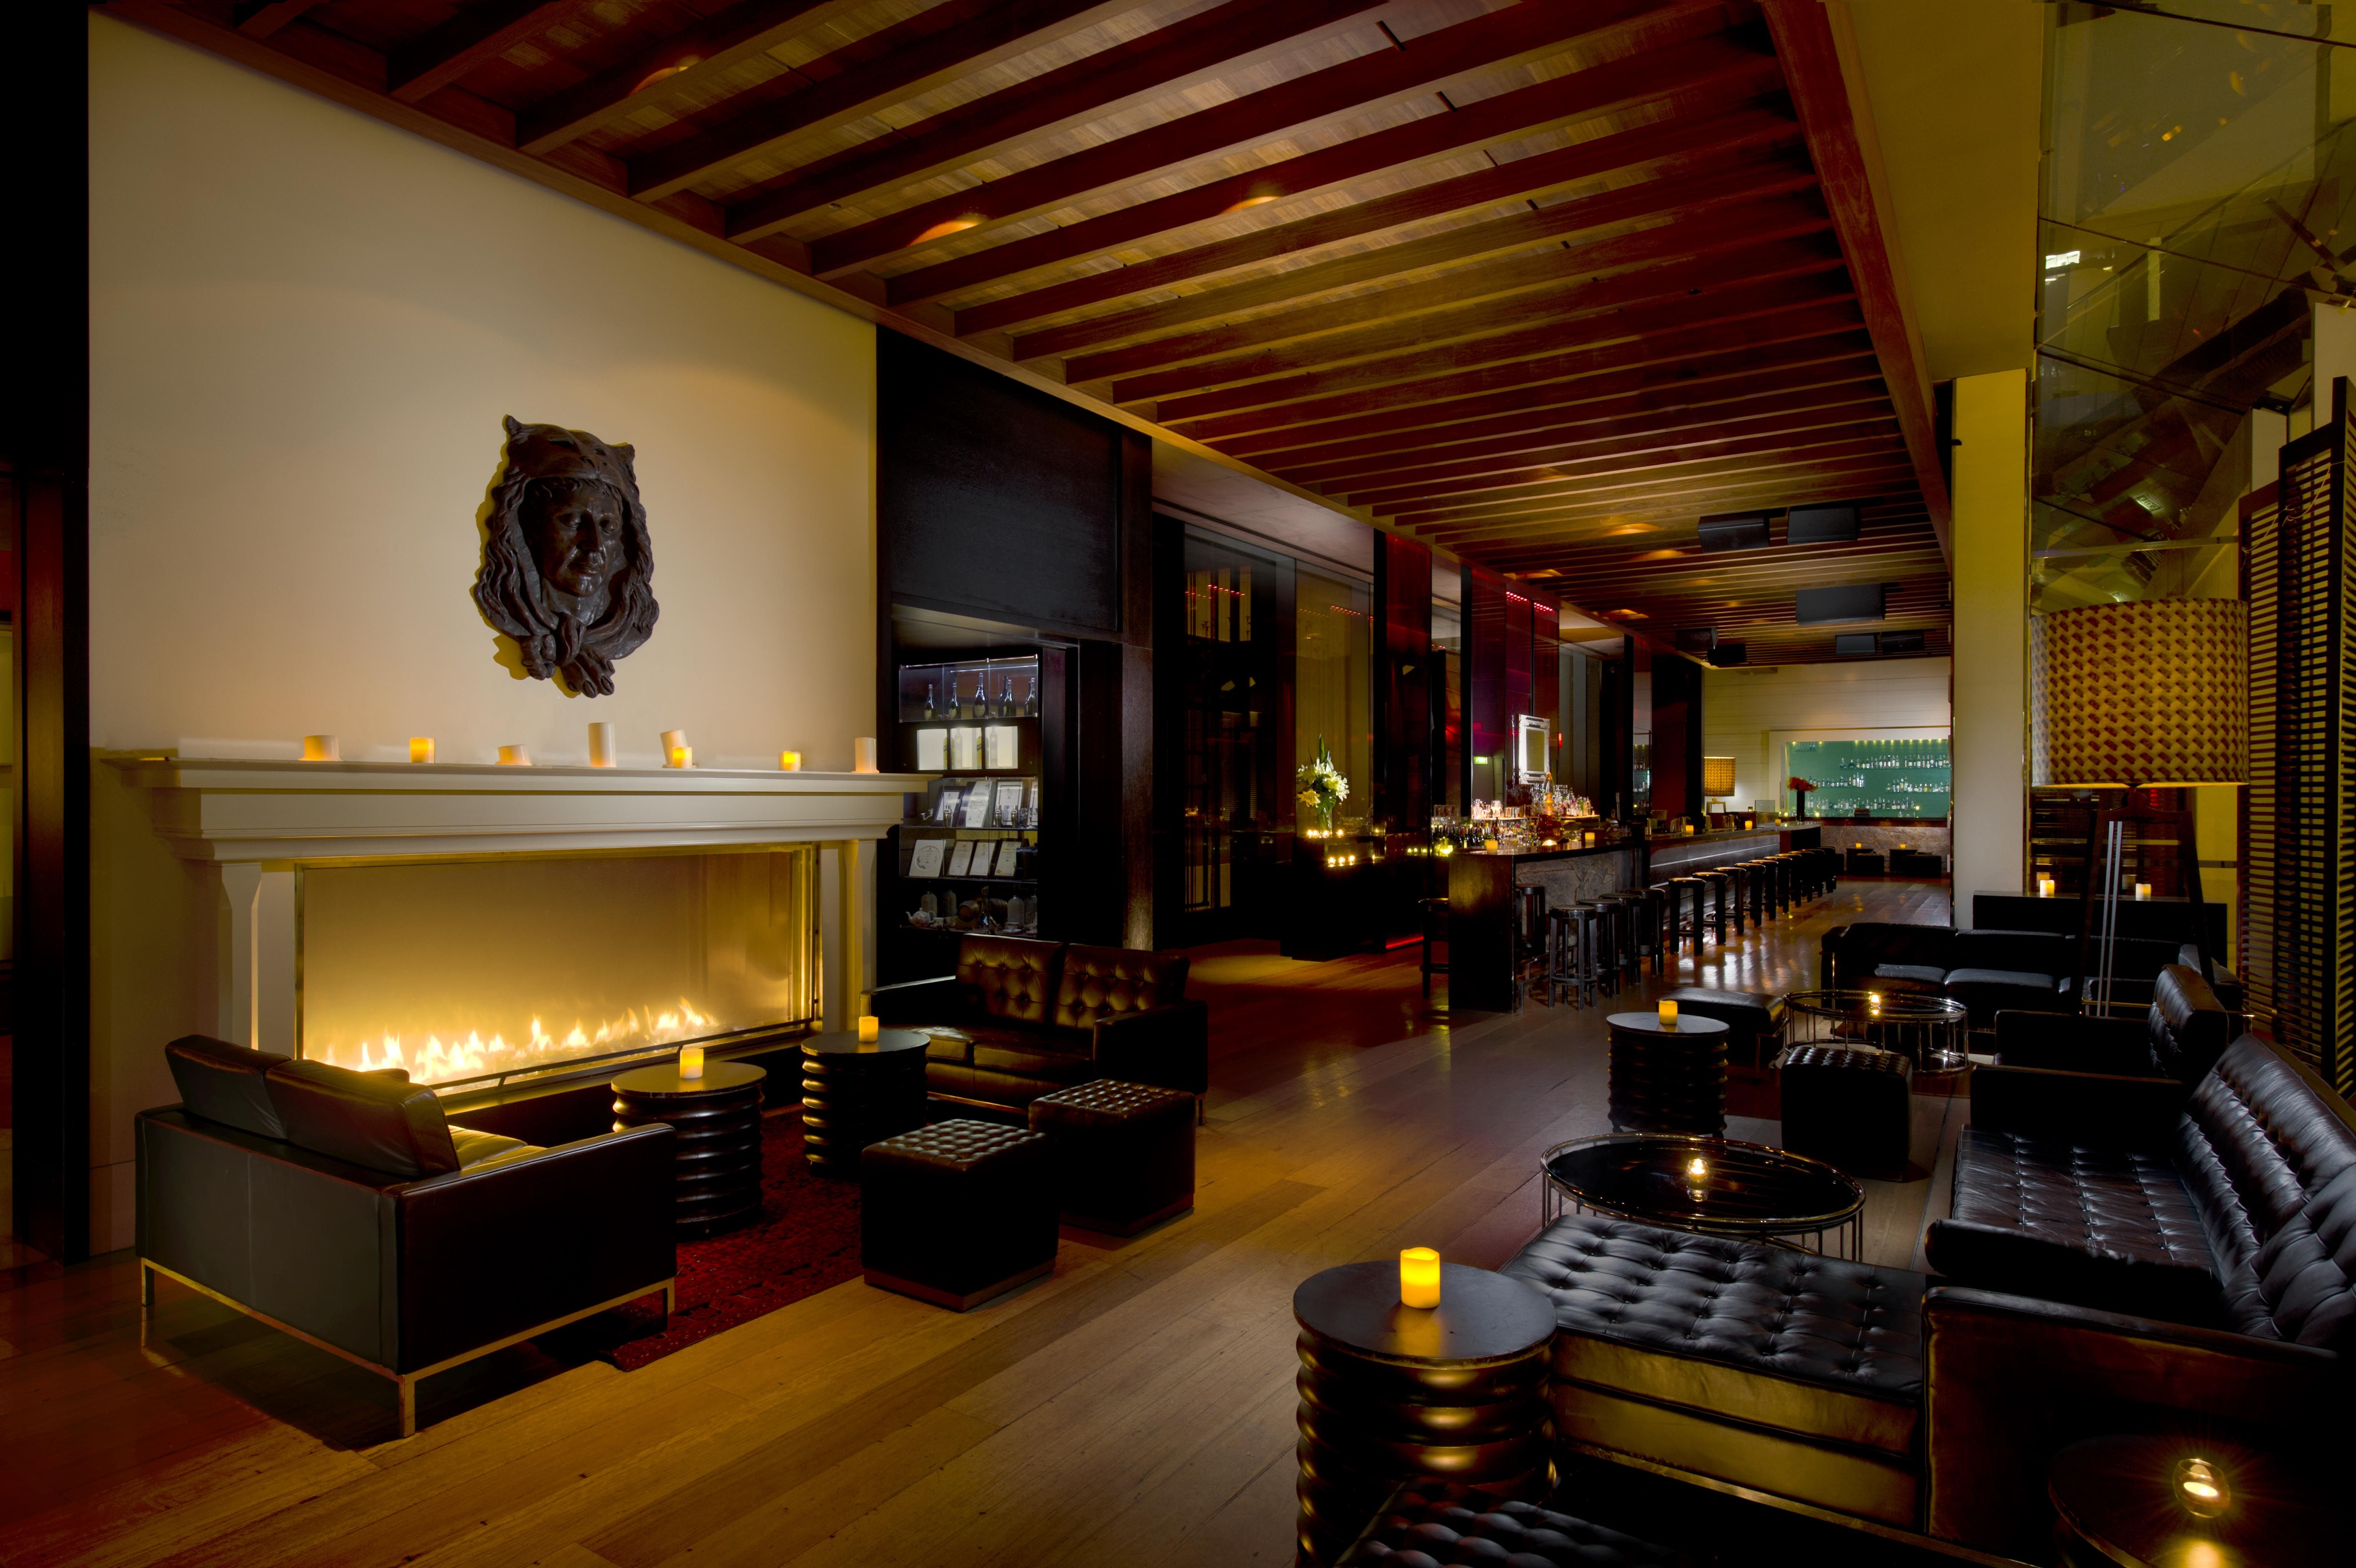 the suave lounge area at Zeta bar in the Hilton Sydney ...